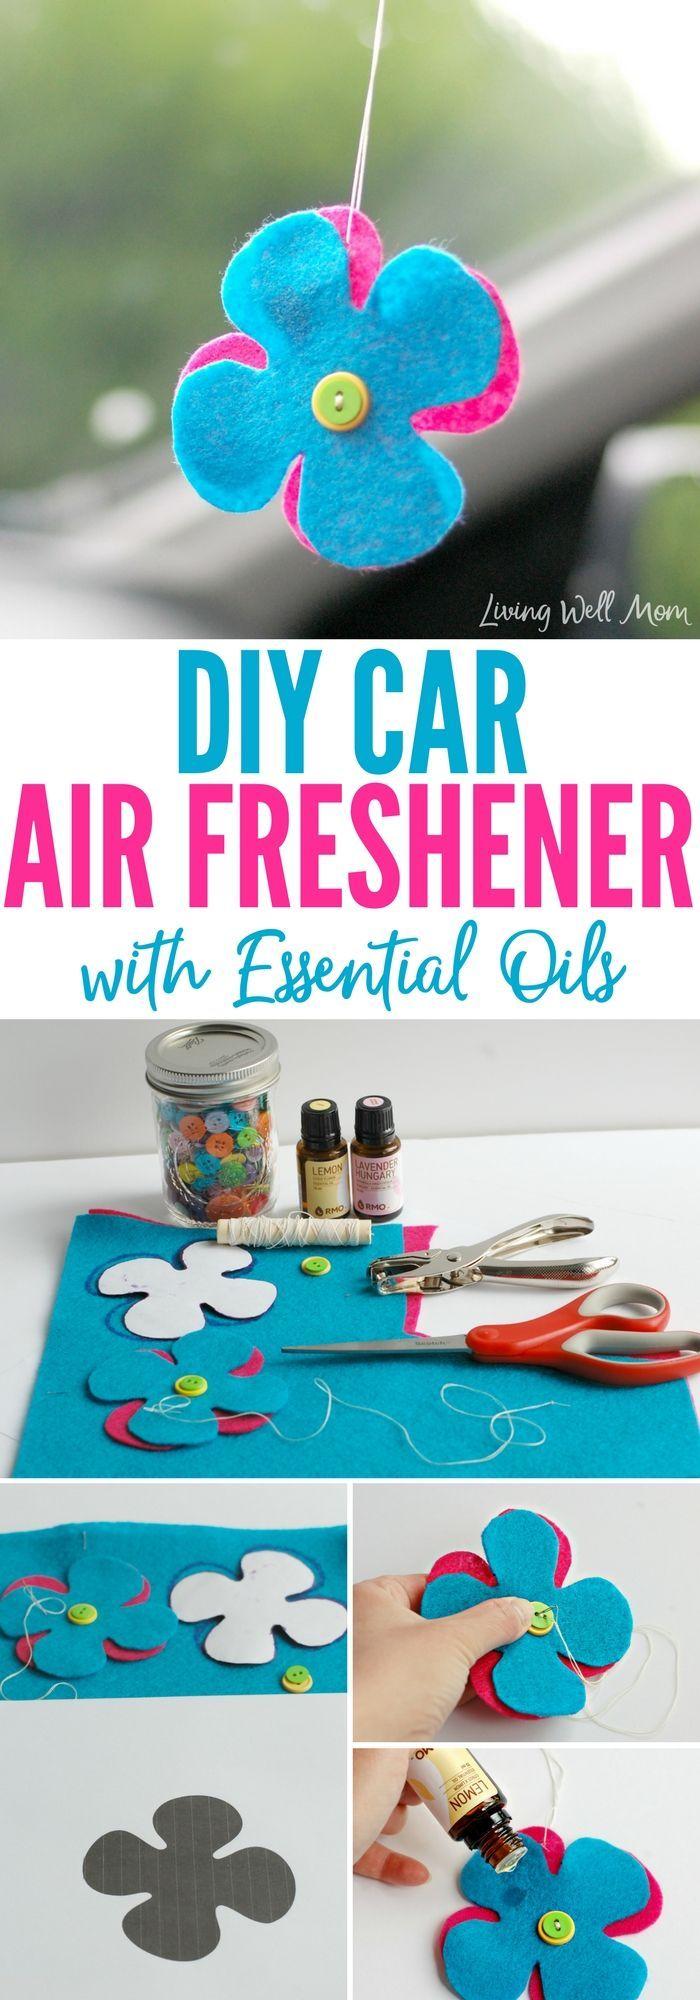 DIY Car Air Freshener with Essential Oils Homemade air